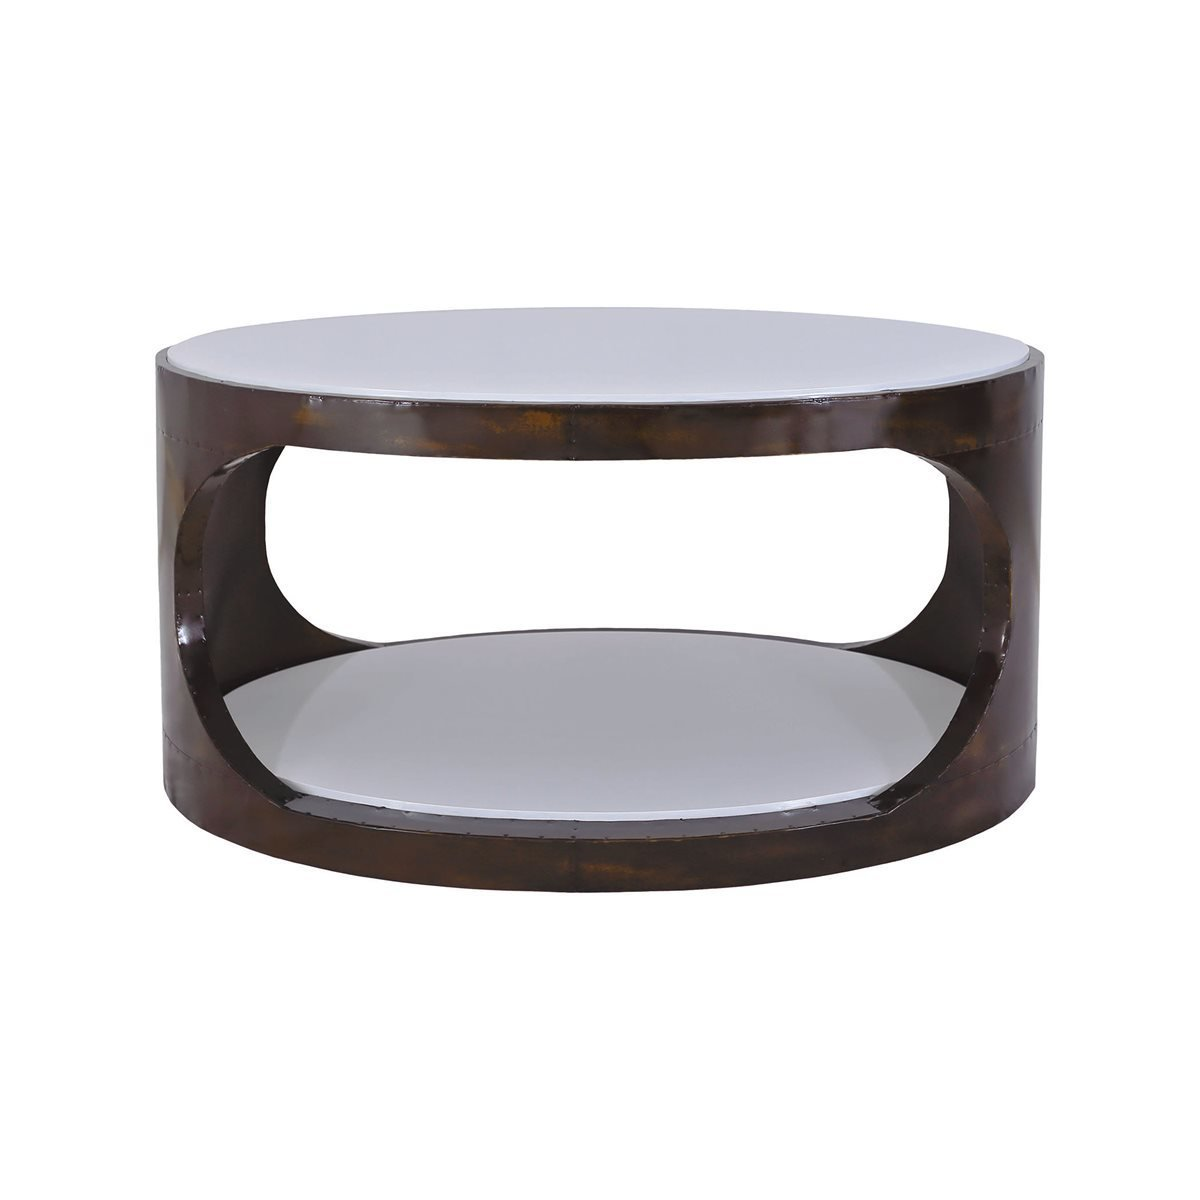 Mr. Mod Coffee Table